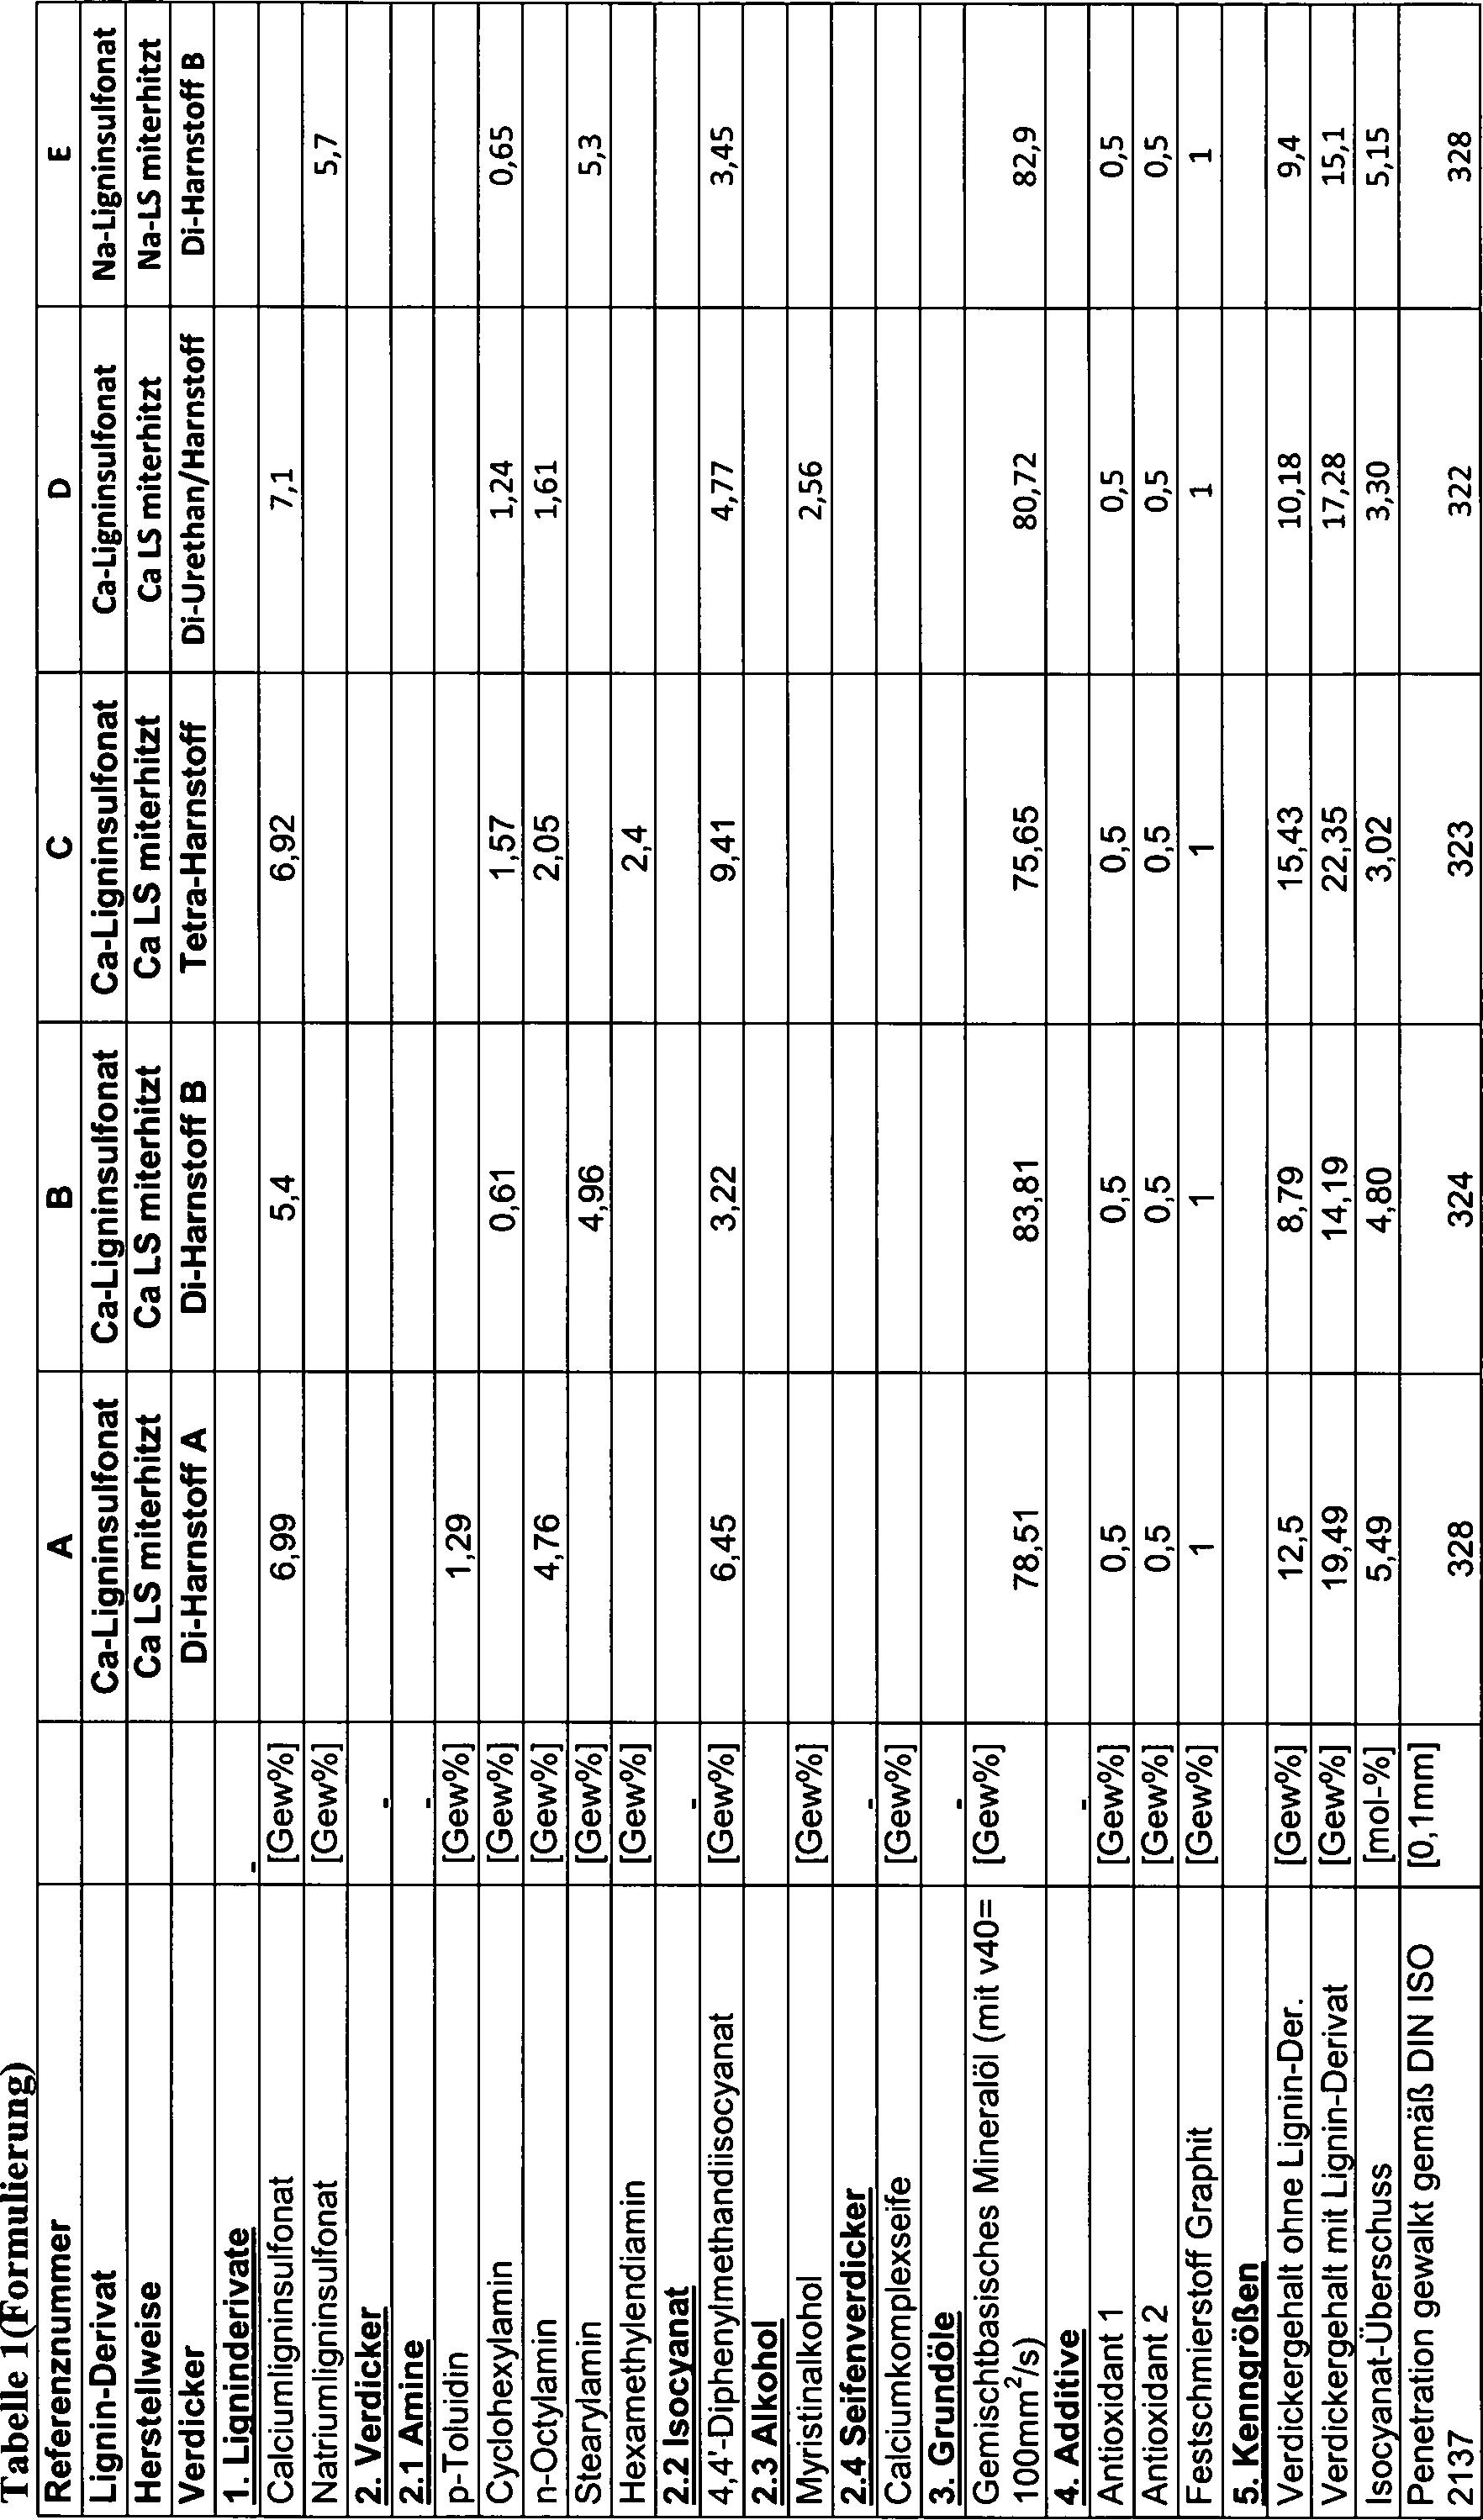 DE102015103440A1 - A process for producing polyurea